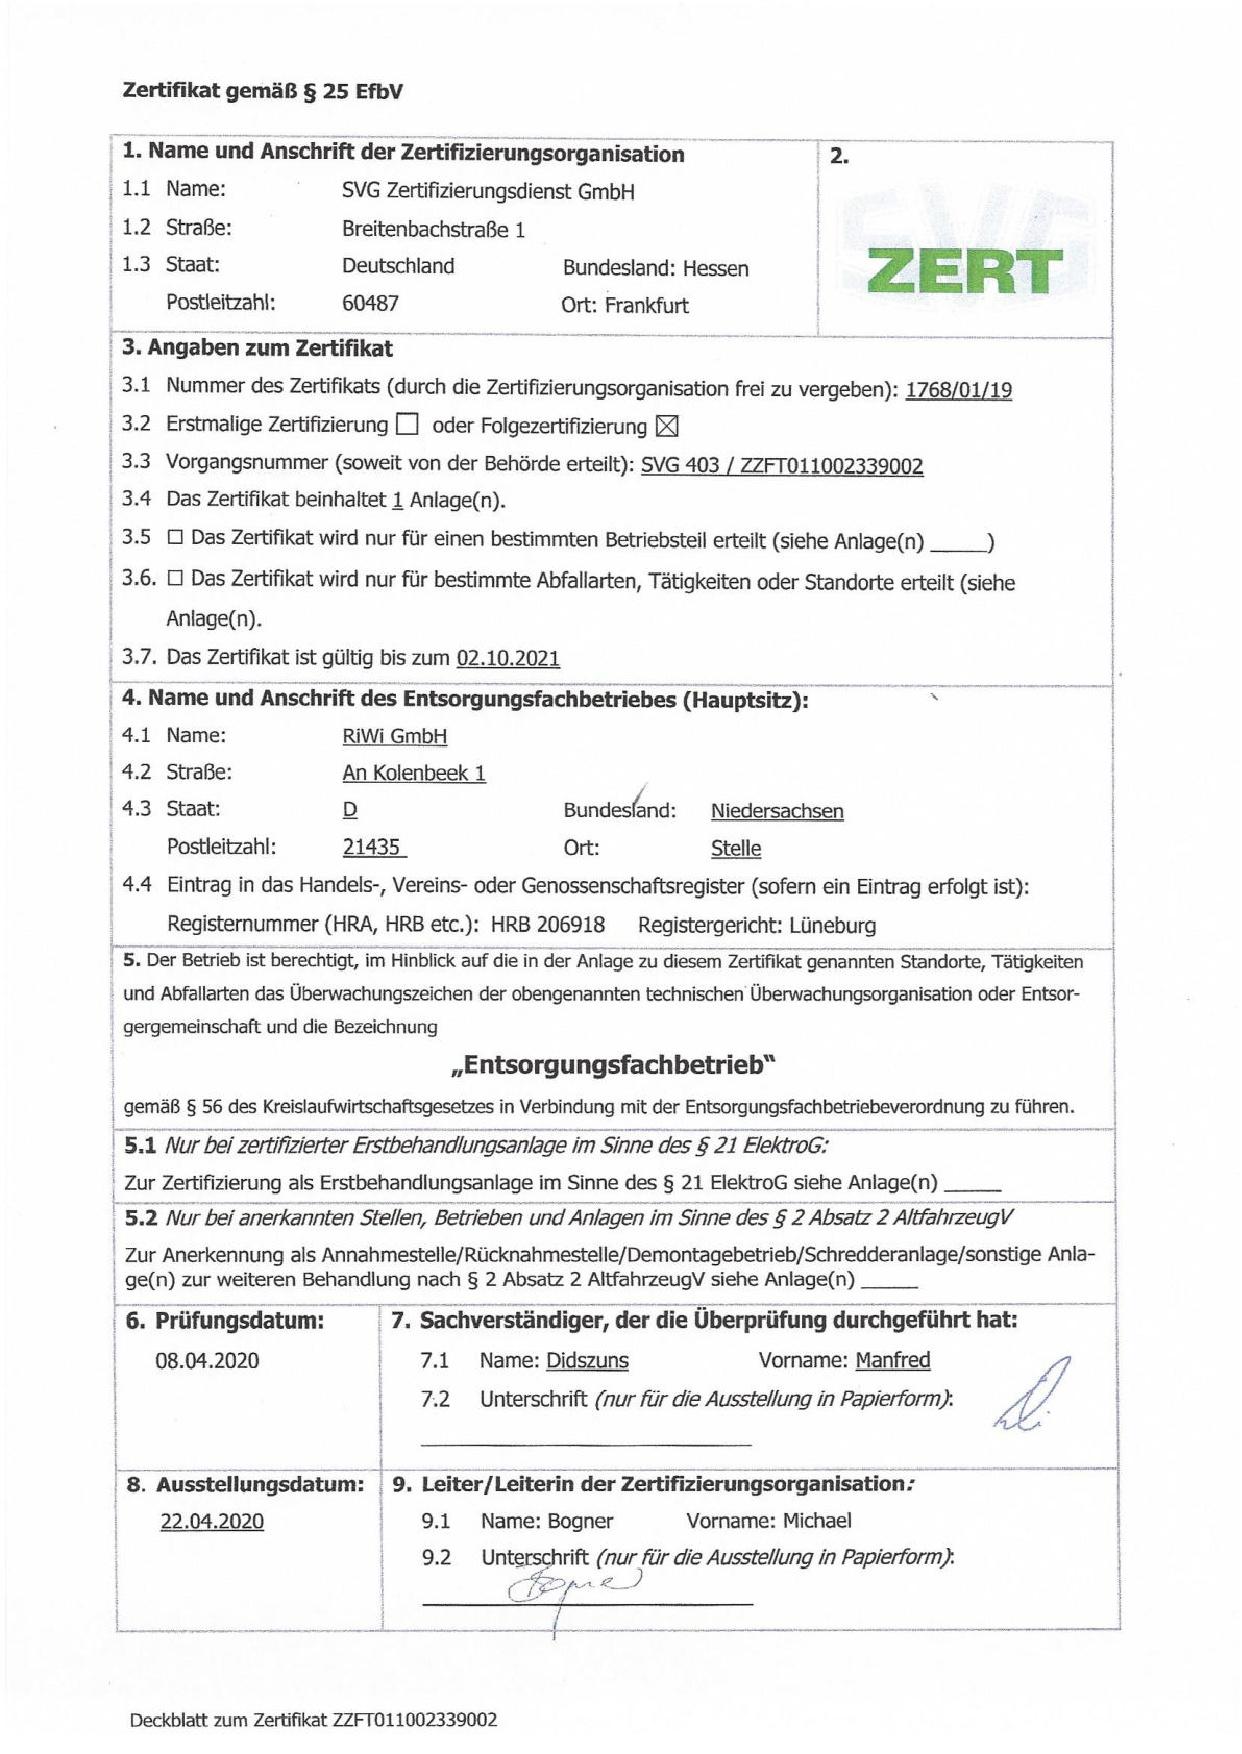 Zertfikat gemäß §25 EfbV Seite 1